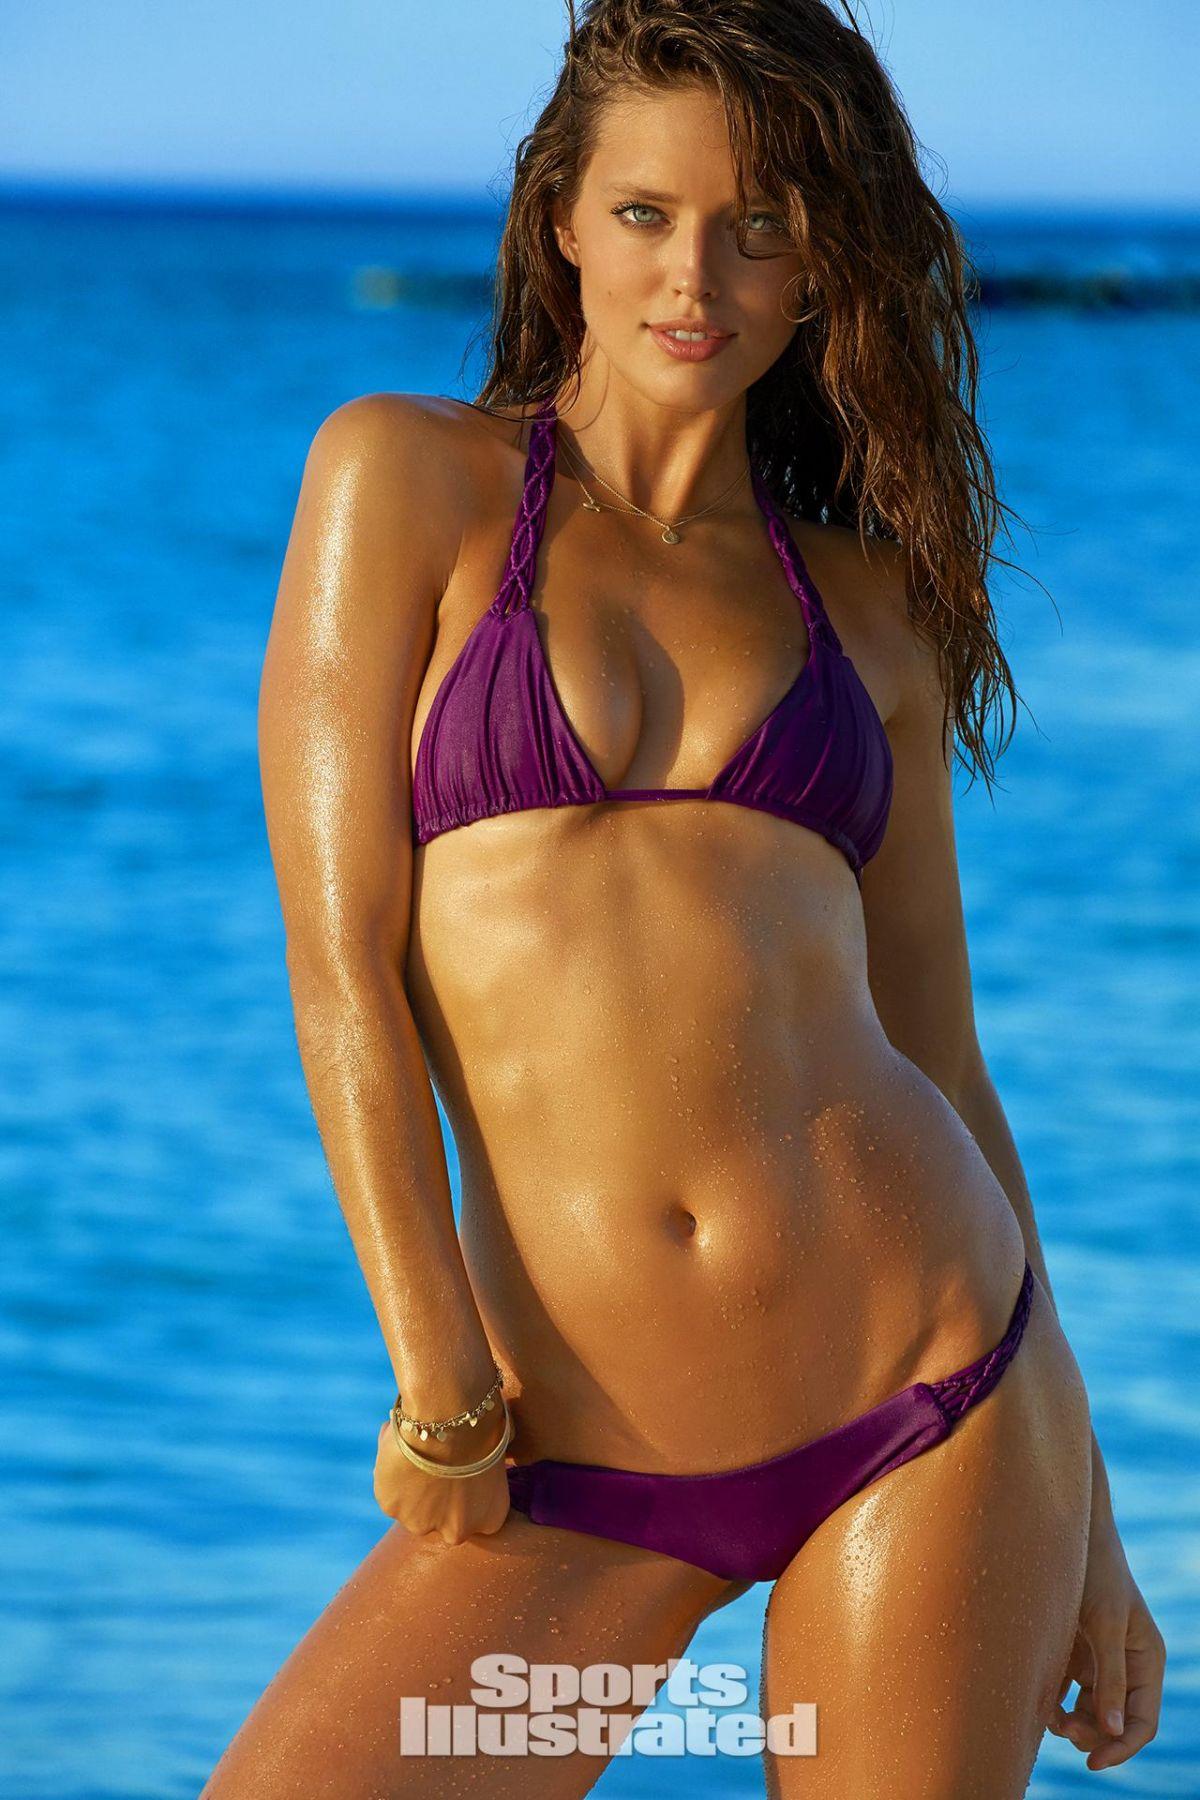 Olivia Culpo - Sports Illustrated Swimsuit 2019 - Celebzz